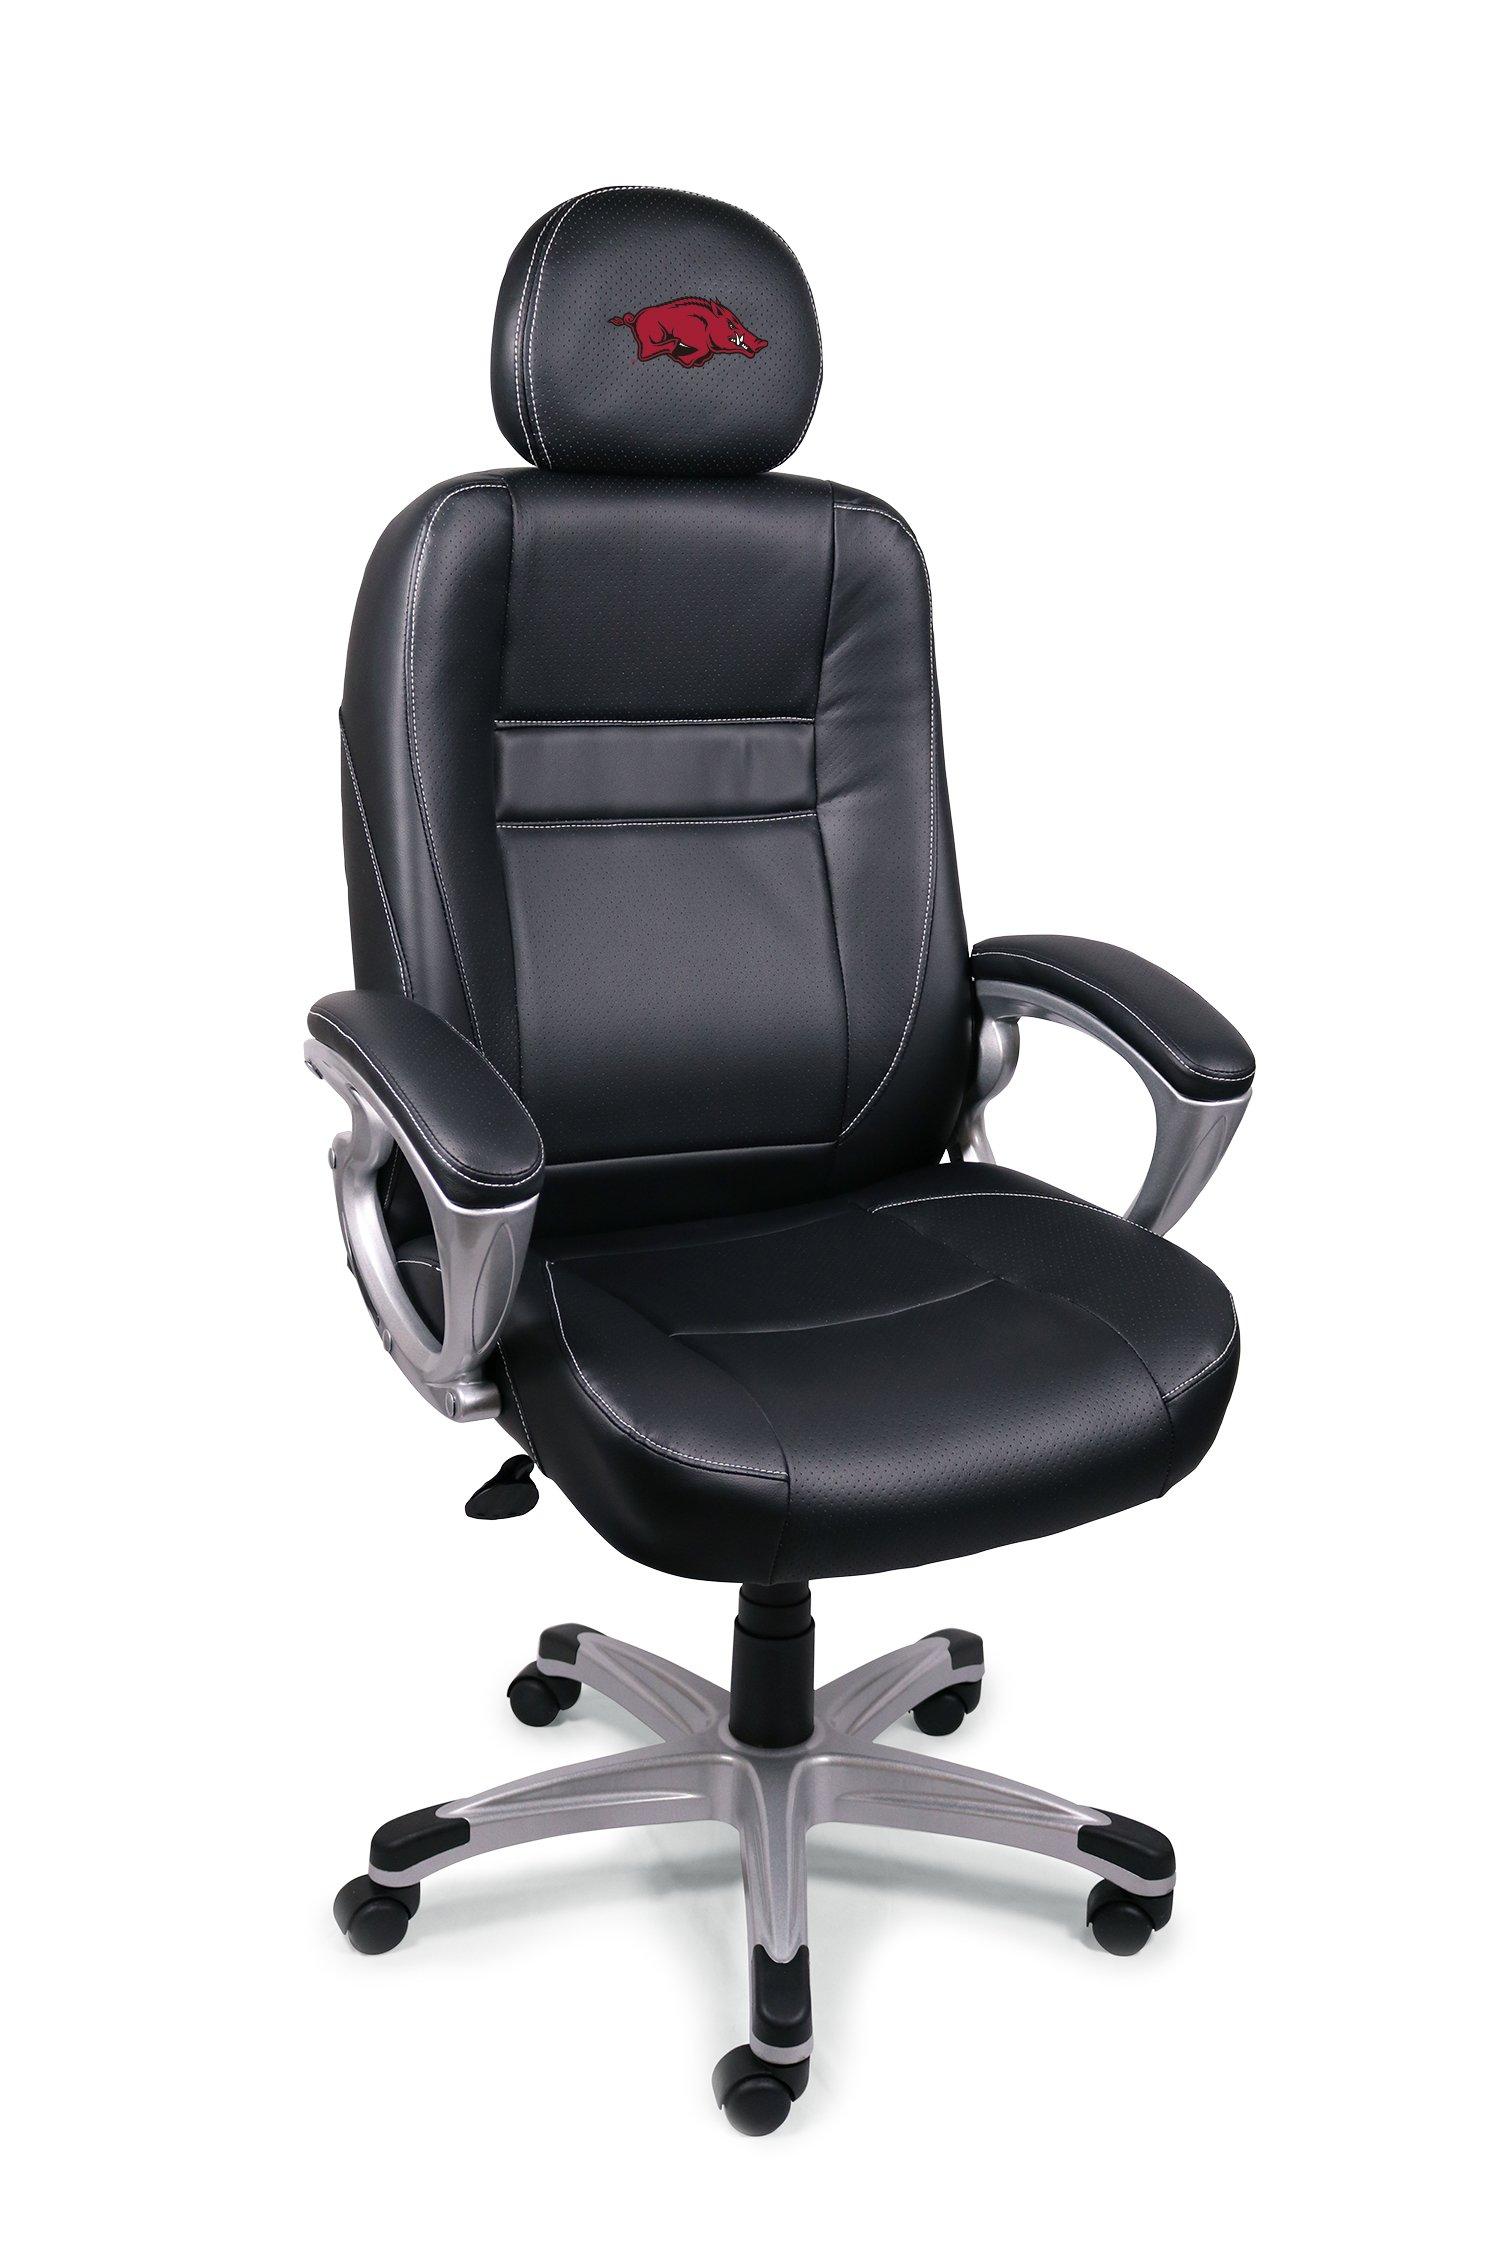 Wild Sports NCAA College Arkansas Razorbacks Leather Office Chair